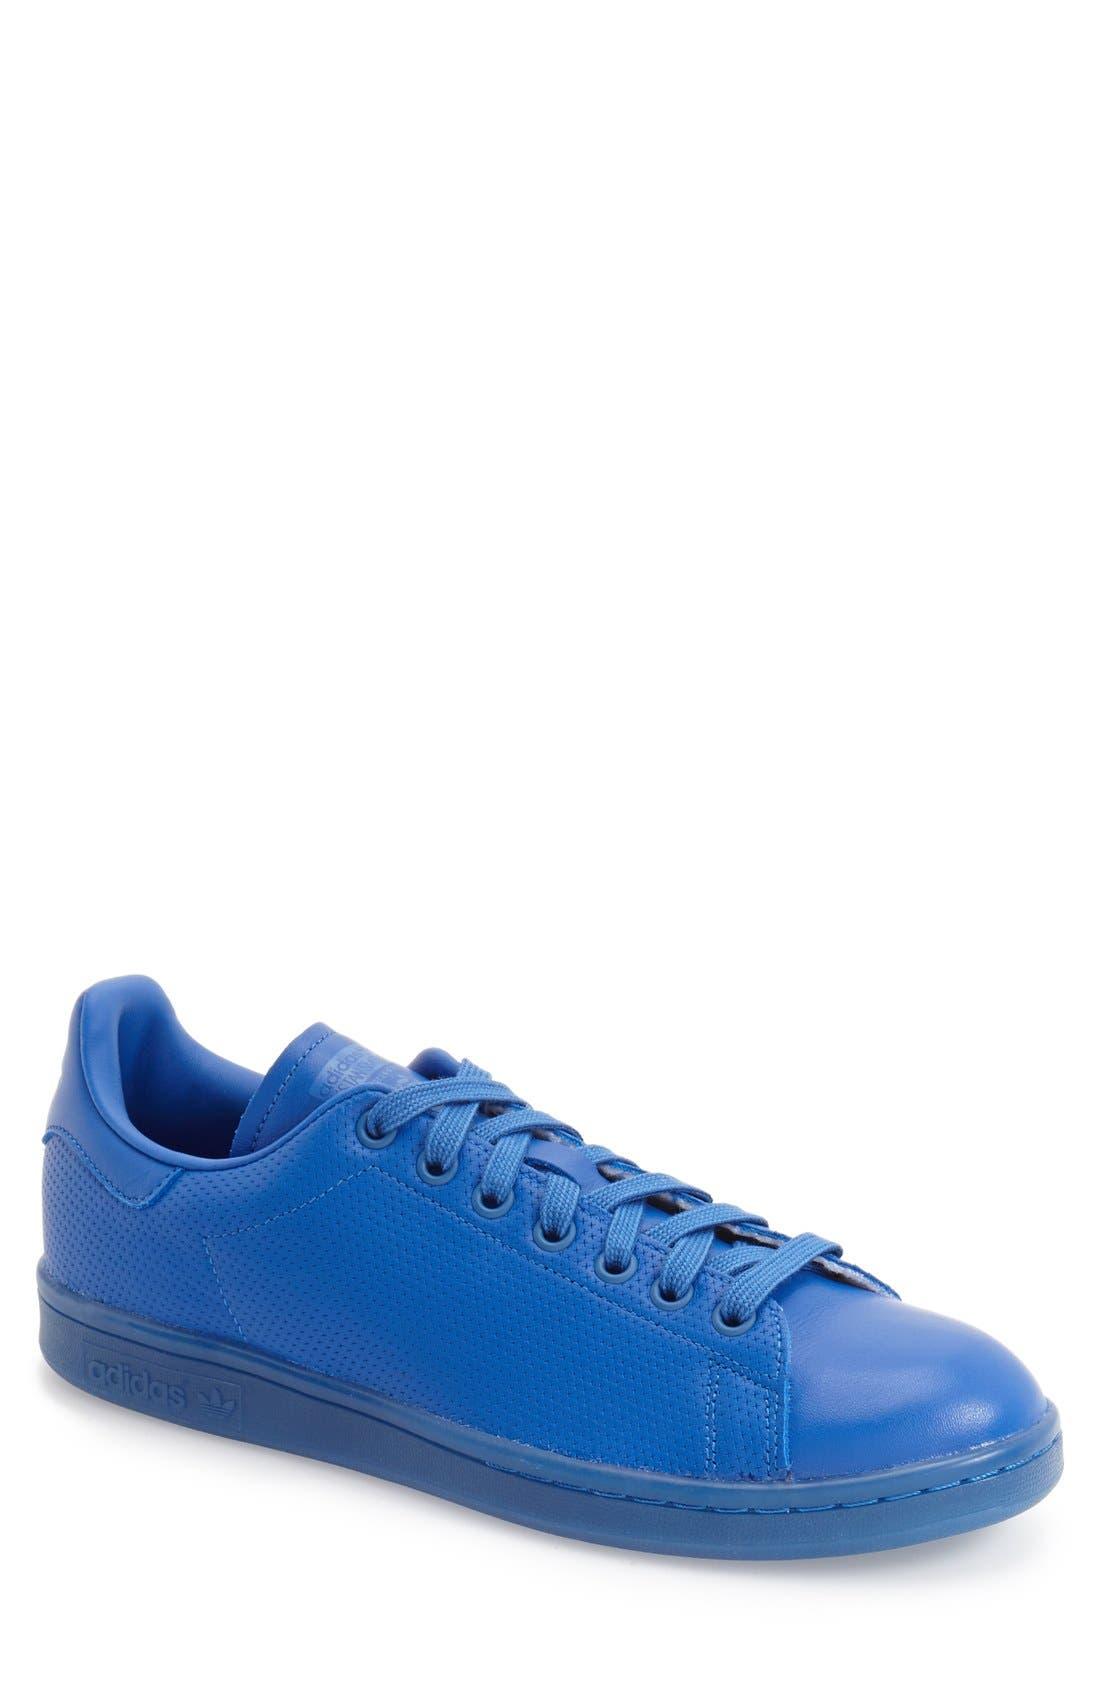 'Stan Smith' Sneaker,                             Main thumbnail 1, color,                             435